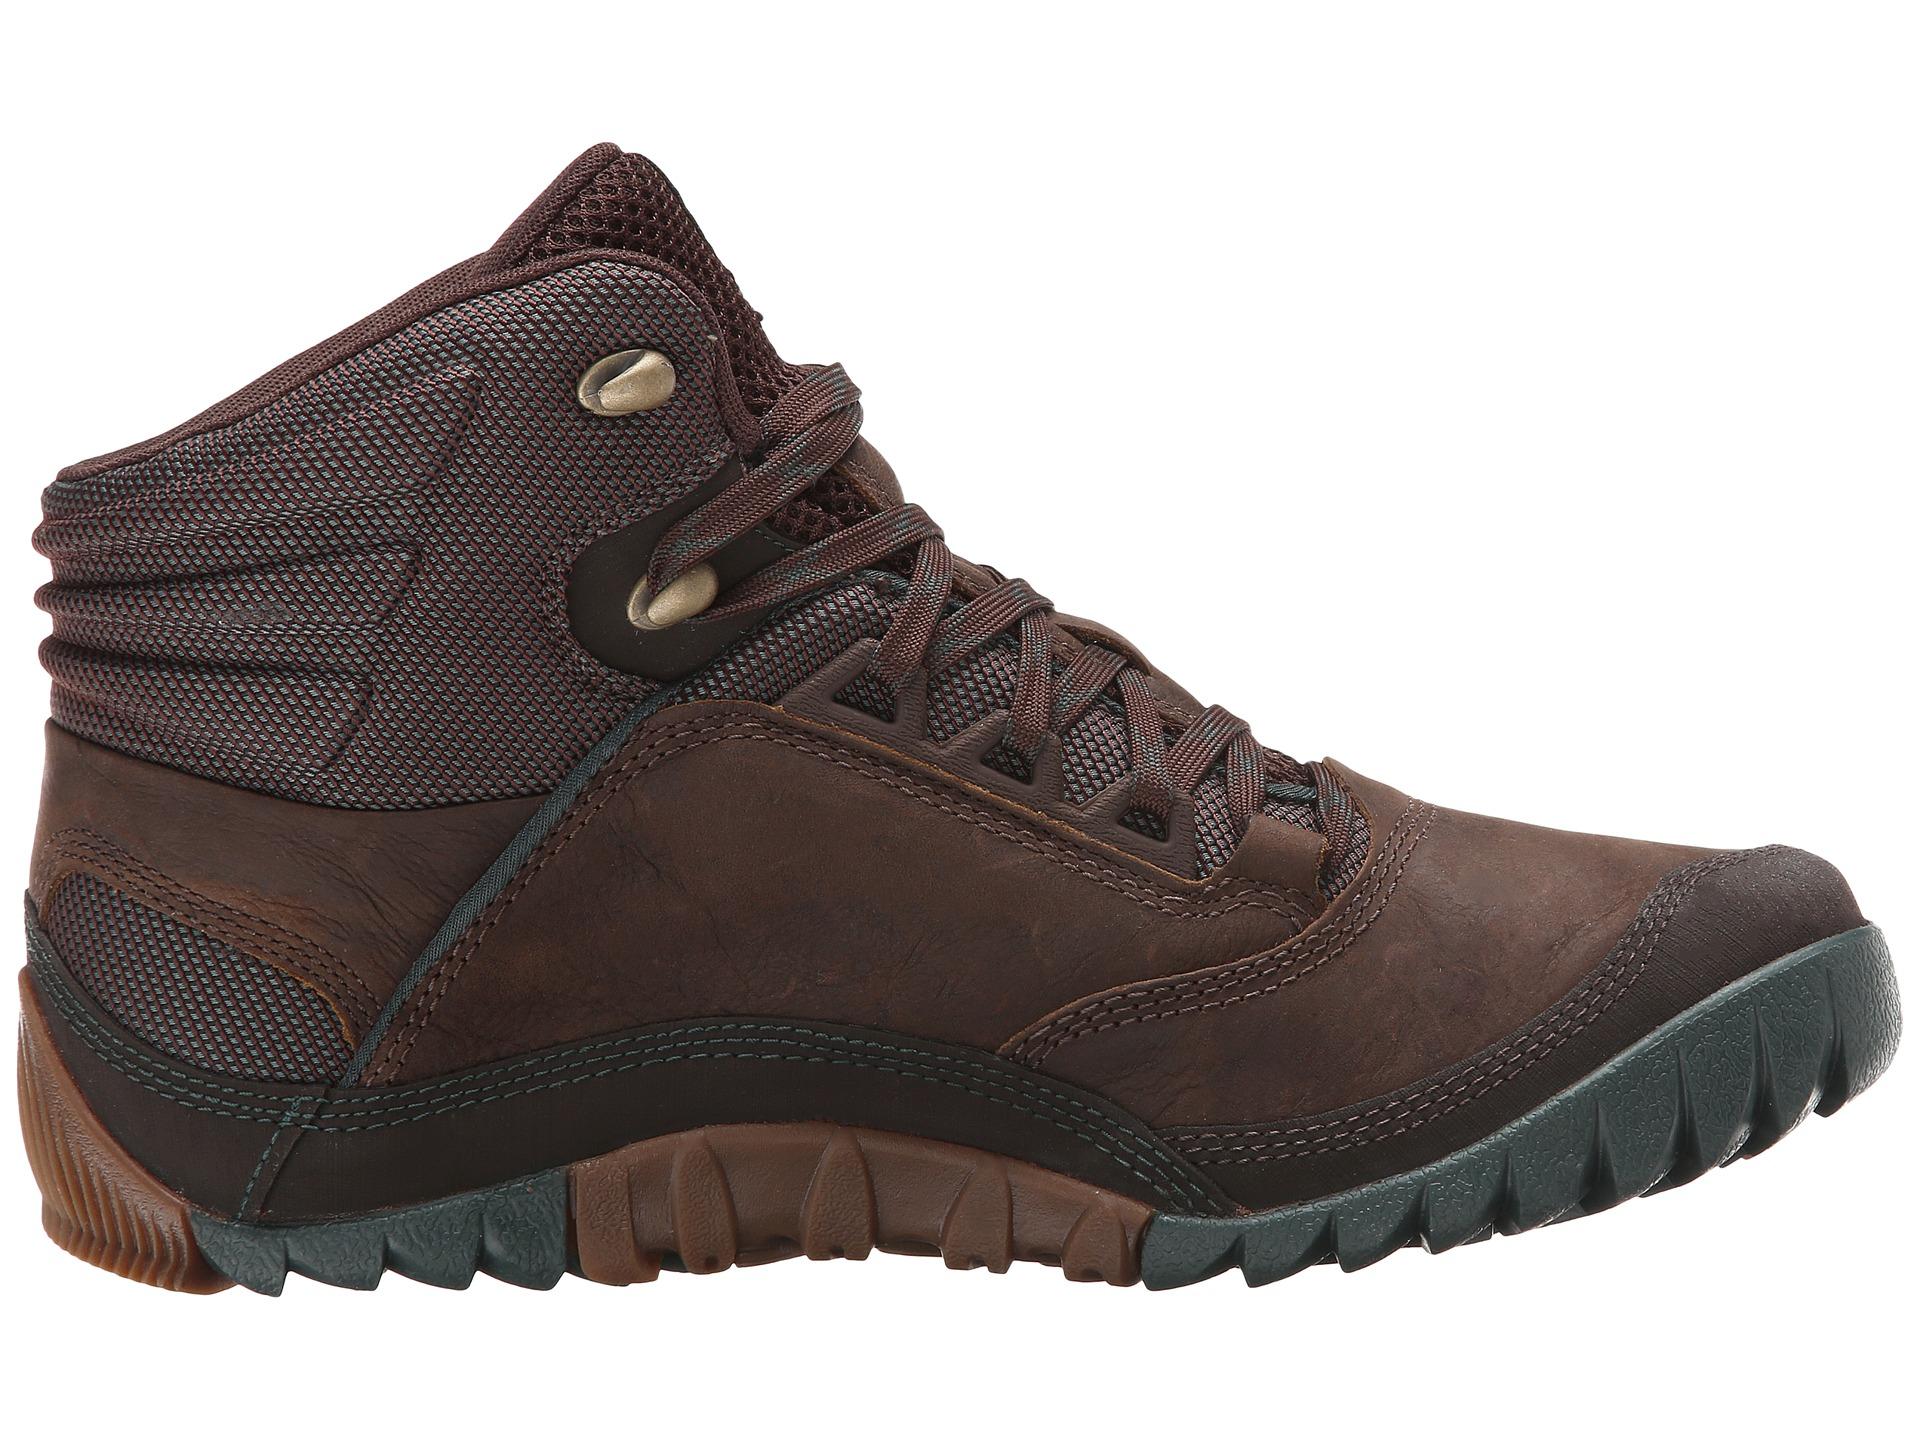 N S Annex Mid Gore Tex Hiking Shoe